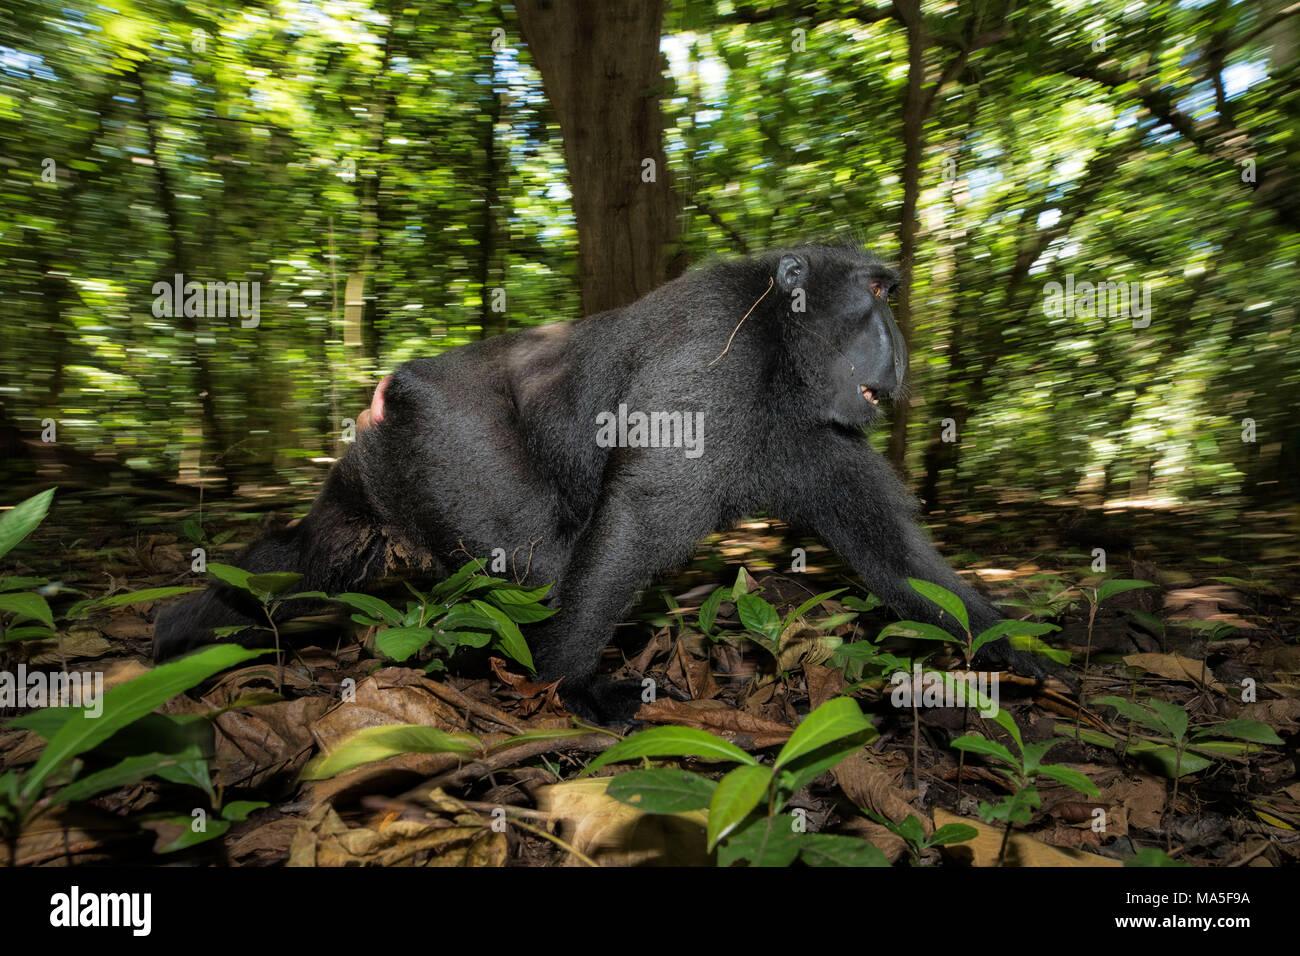 Black crested macaque, macaca nigra, Tangkoko National Park, Northern Sulawesi, Indonesia - Stock Image